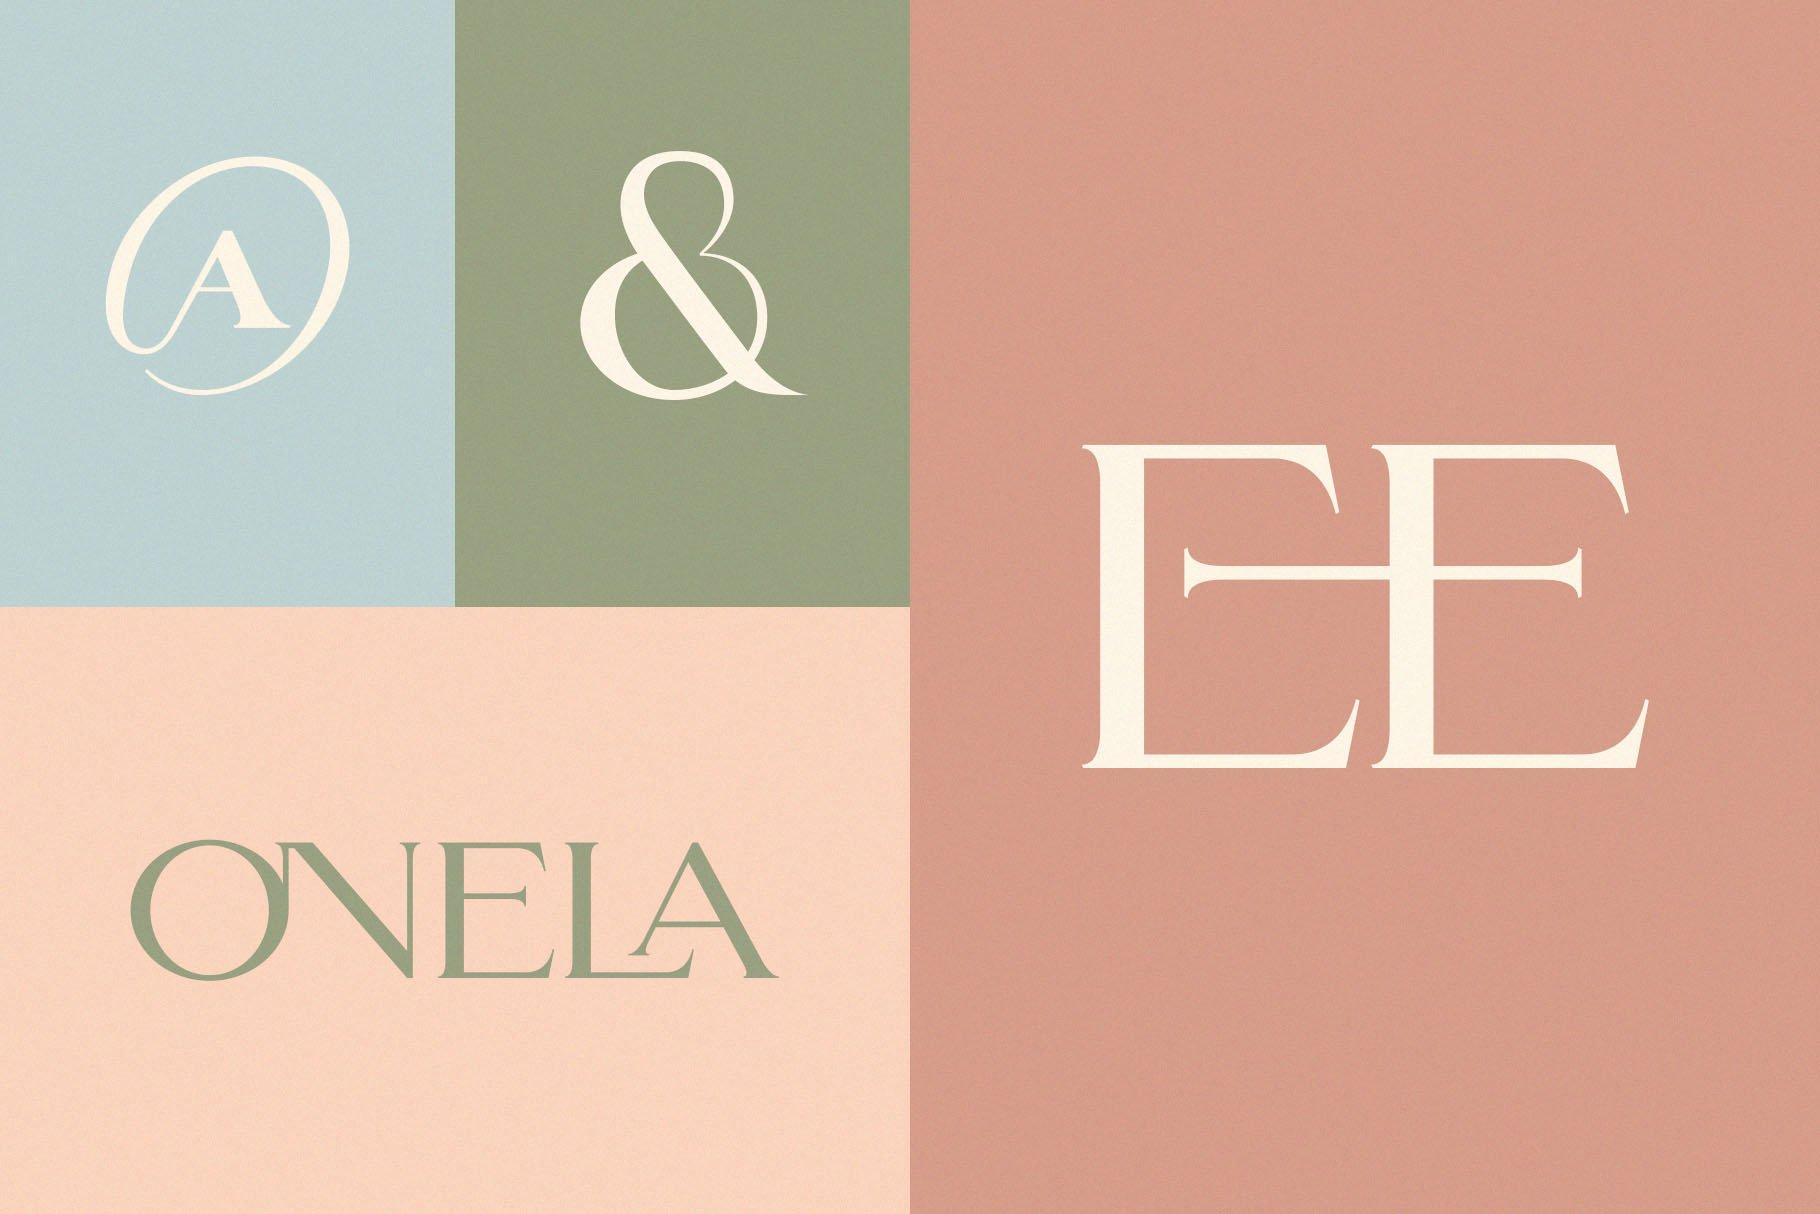 ligatures ligature font minimalist font display font classy font elegant font serif wedding font modern font logo font fashion social media modern serif 8 10